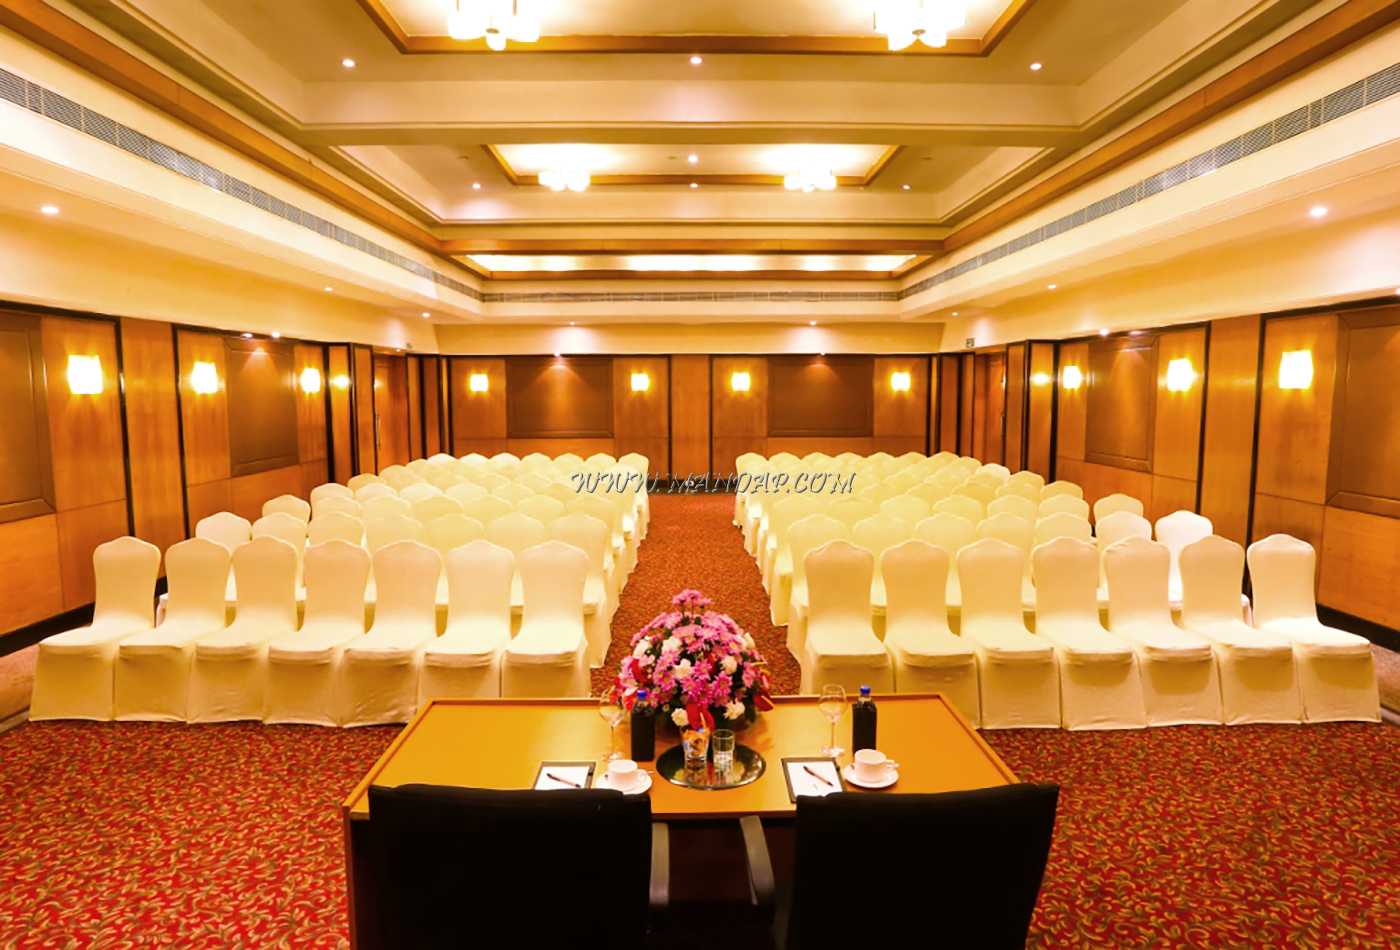 Find More Banquet Halls in Vadapalani